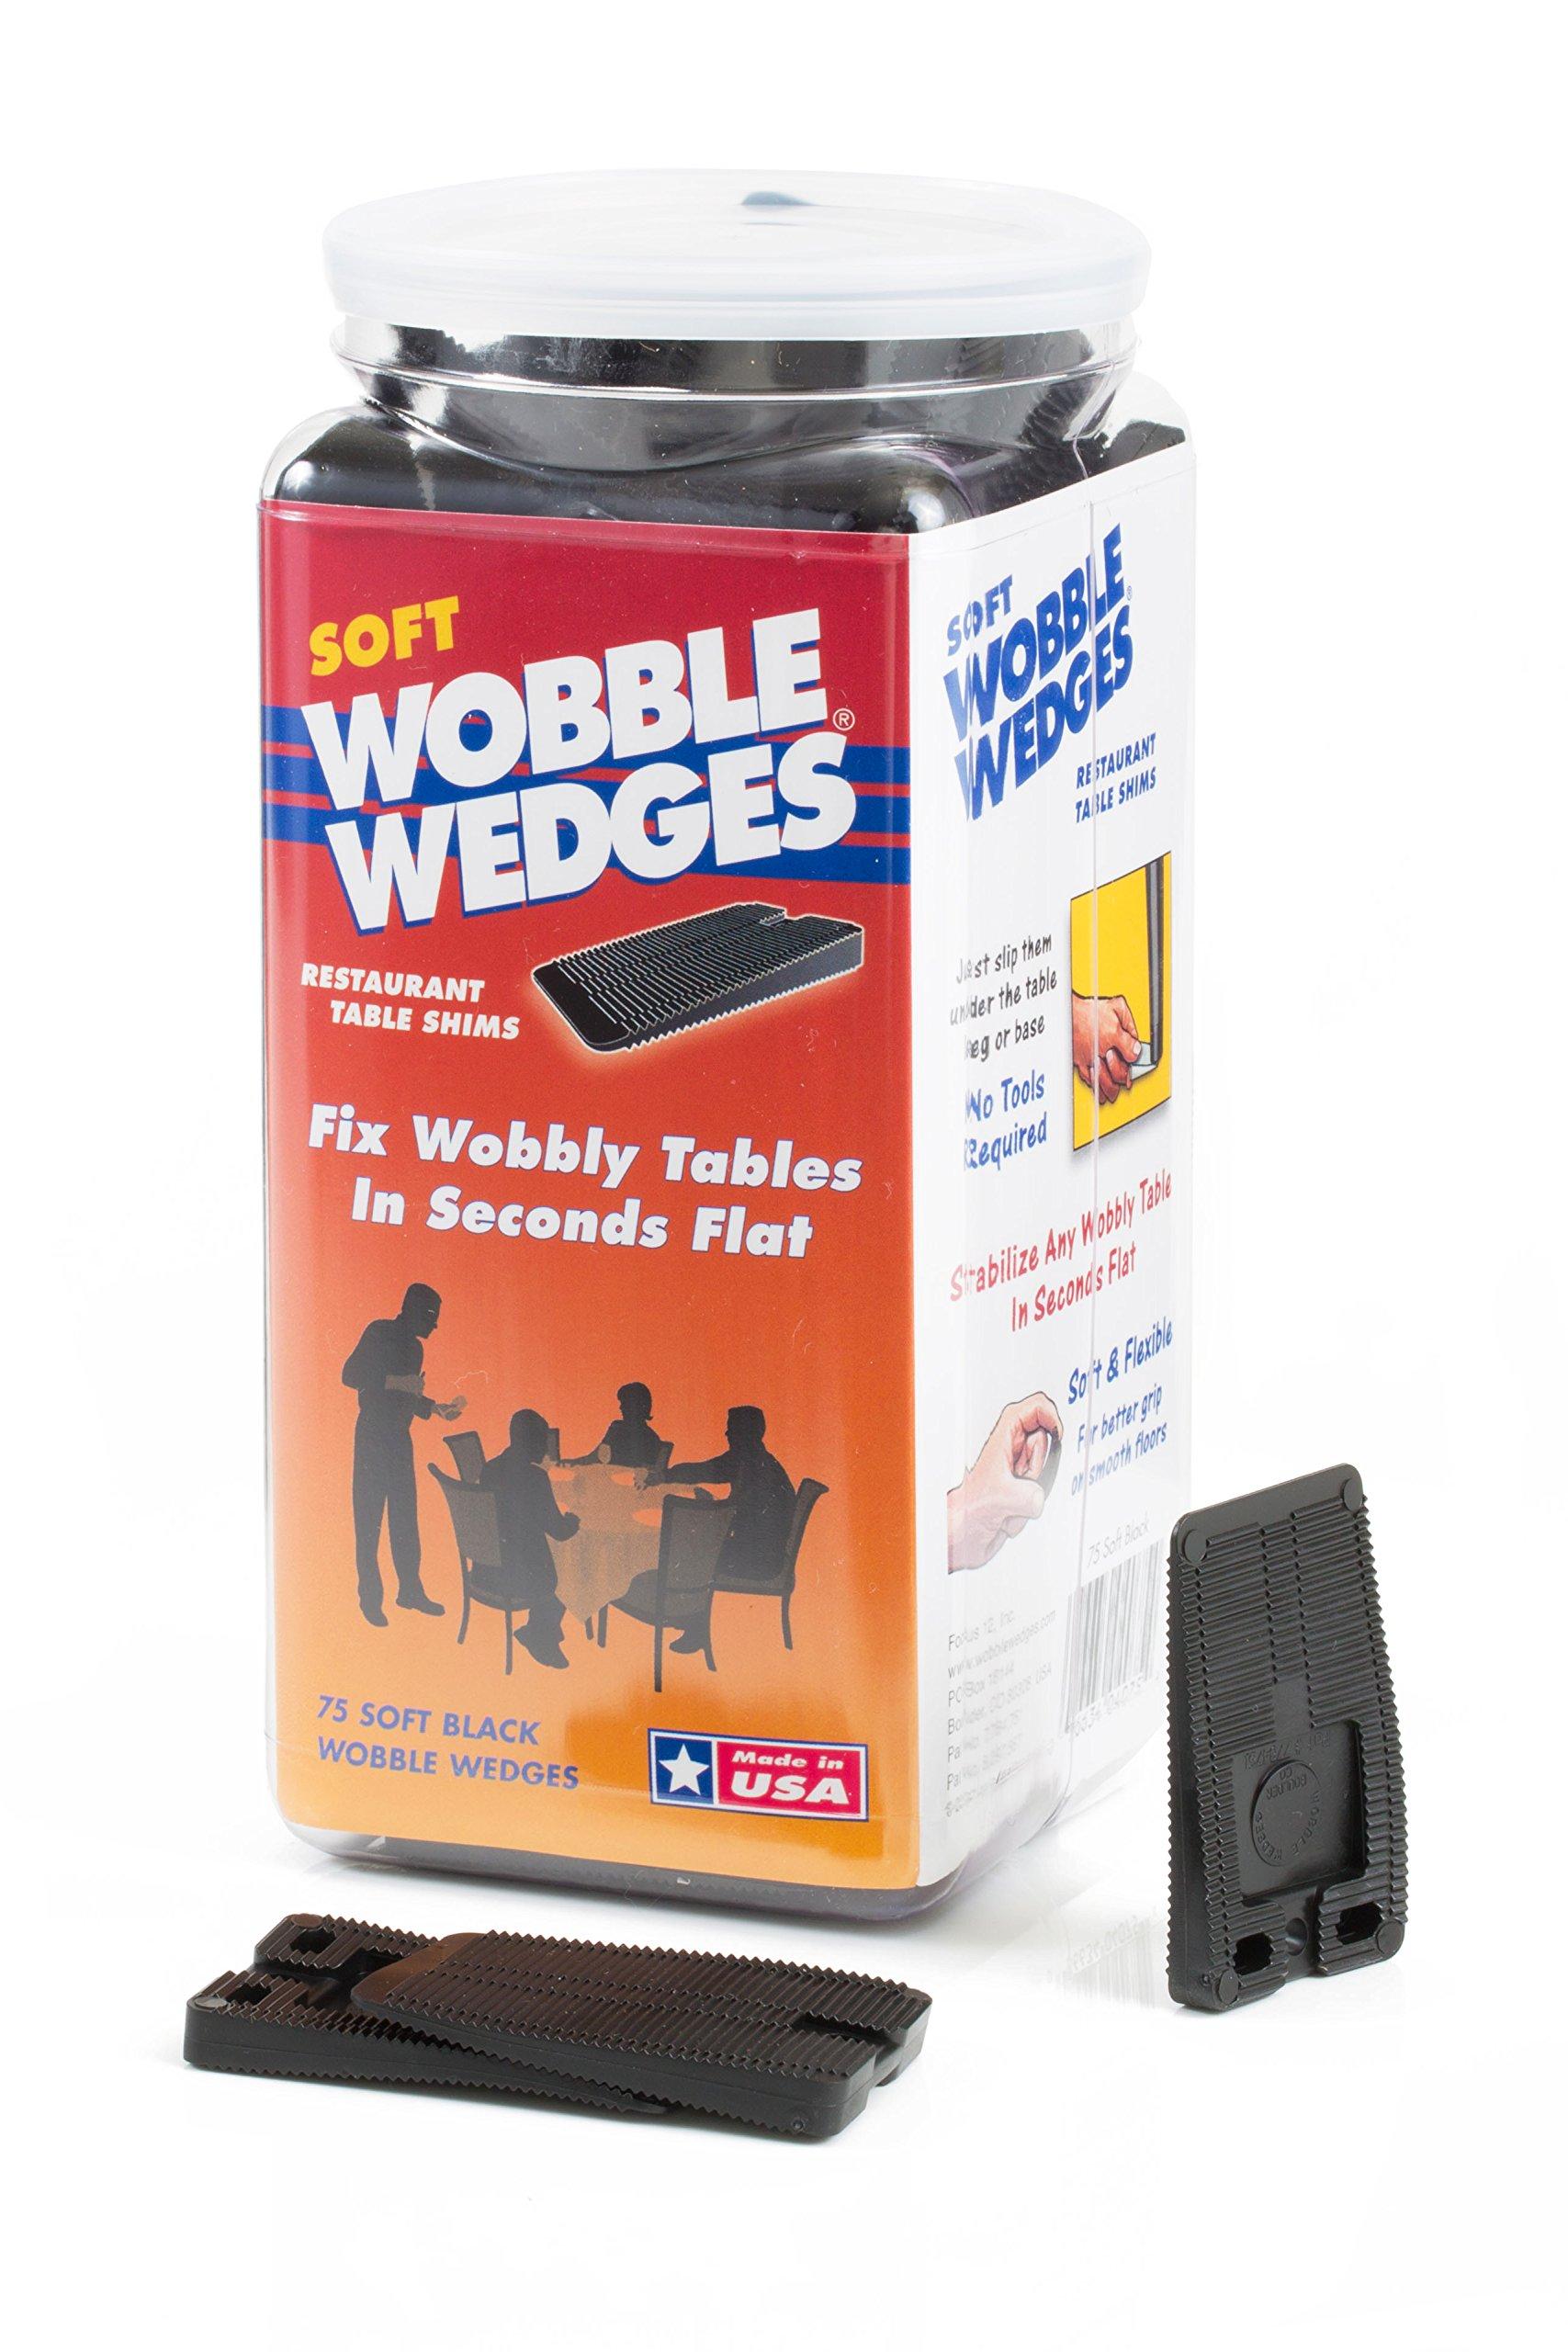 Hard Black 30 Piece Jar Wobble Wedge Restaurant Table Shims